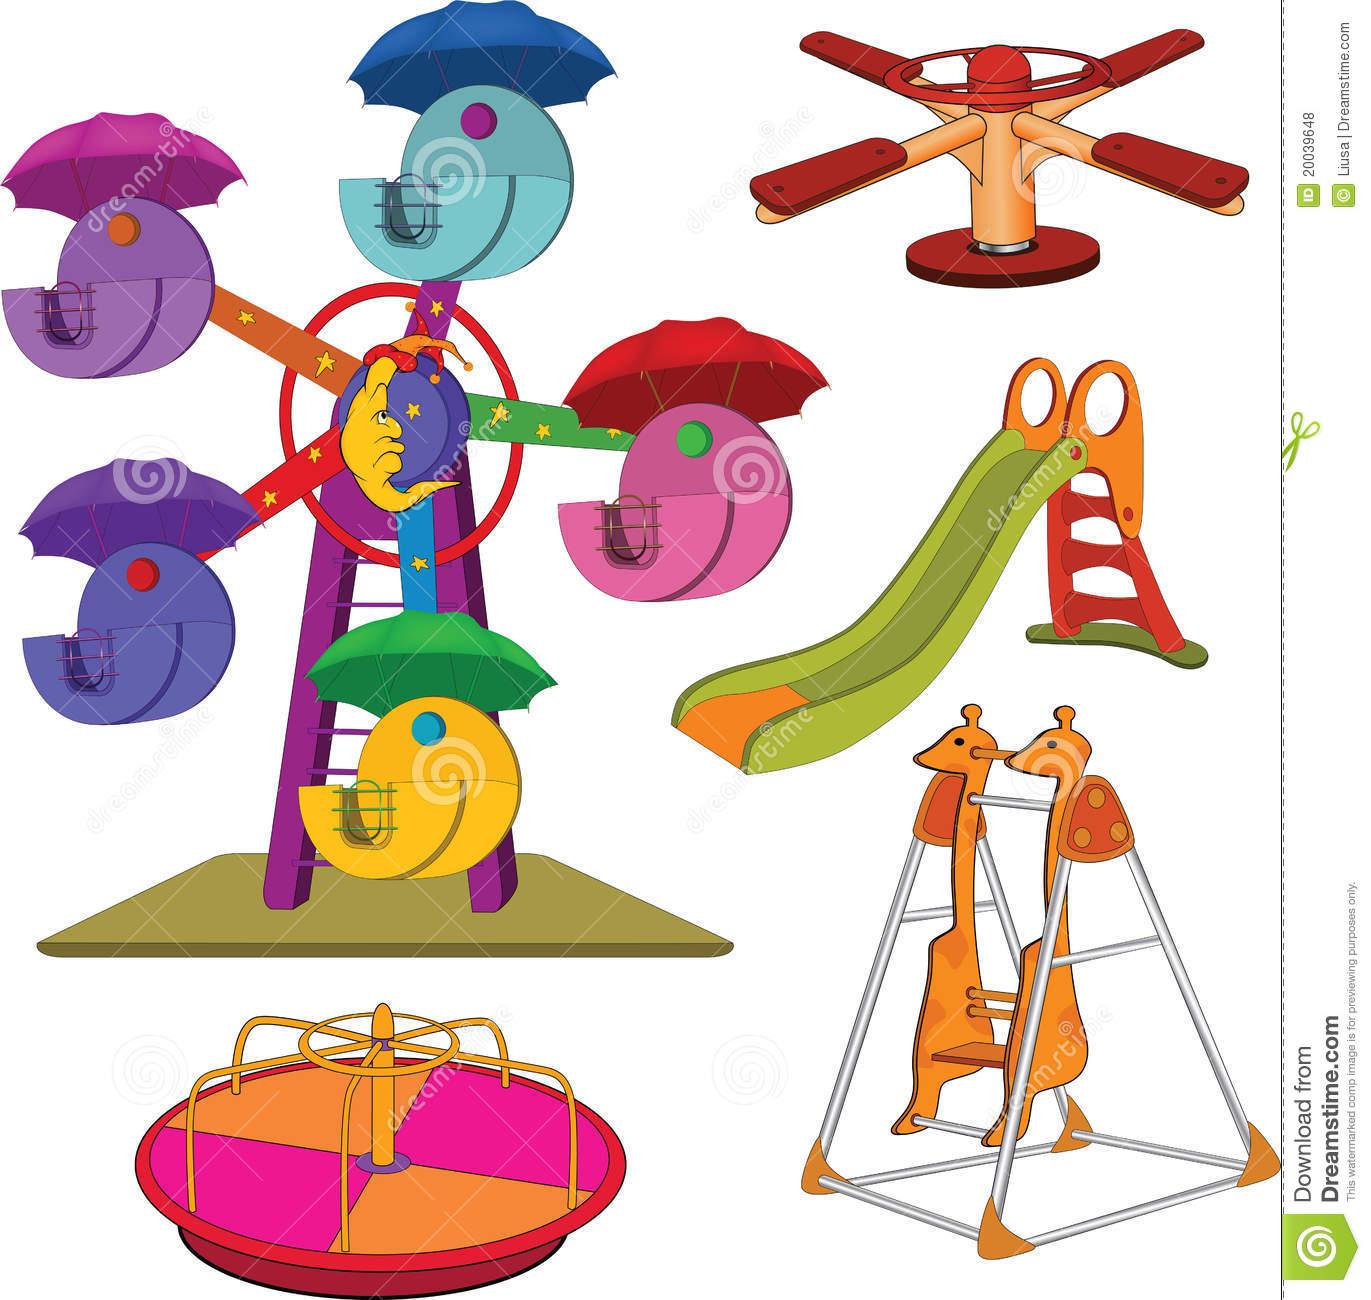 Set Of Children's Roundabouts. Cartoon Royalty Free Stock Photos.